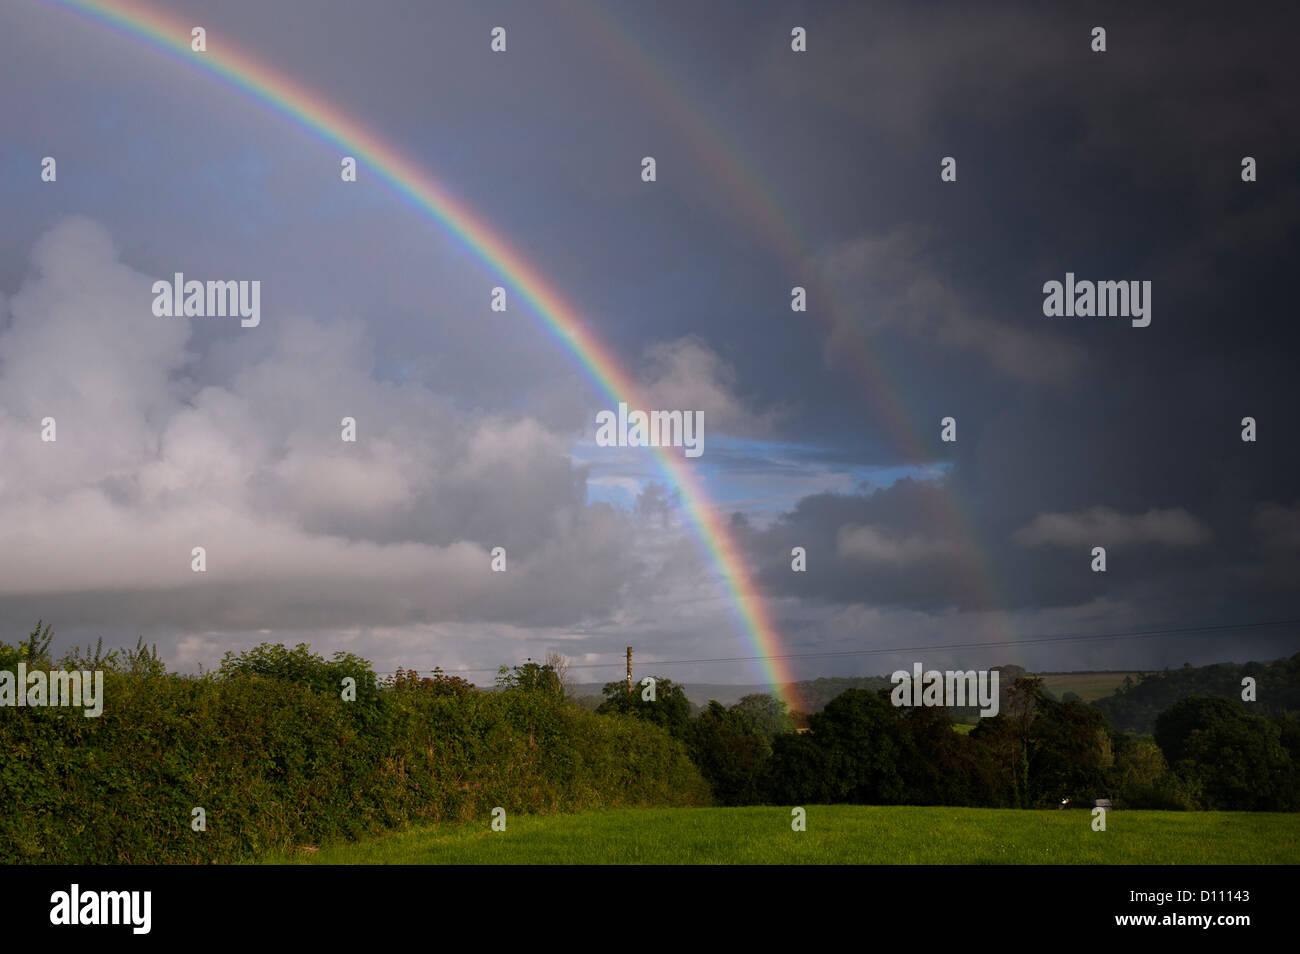 Double rainbow over farmland in North Cornwall, UK. Stock Photo